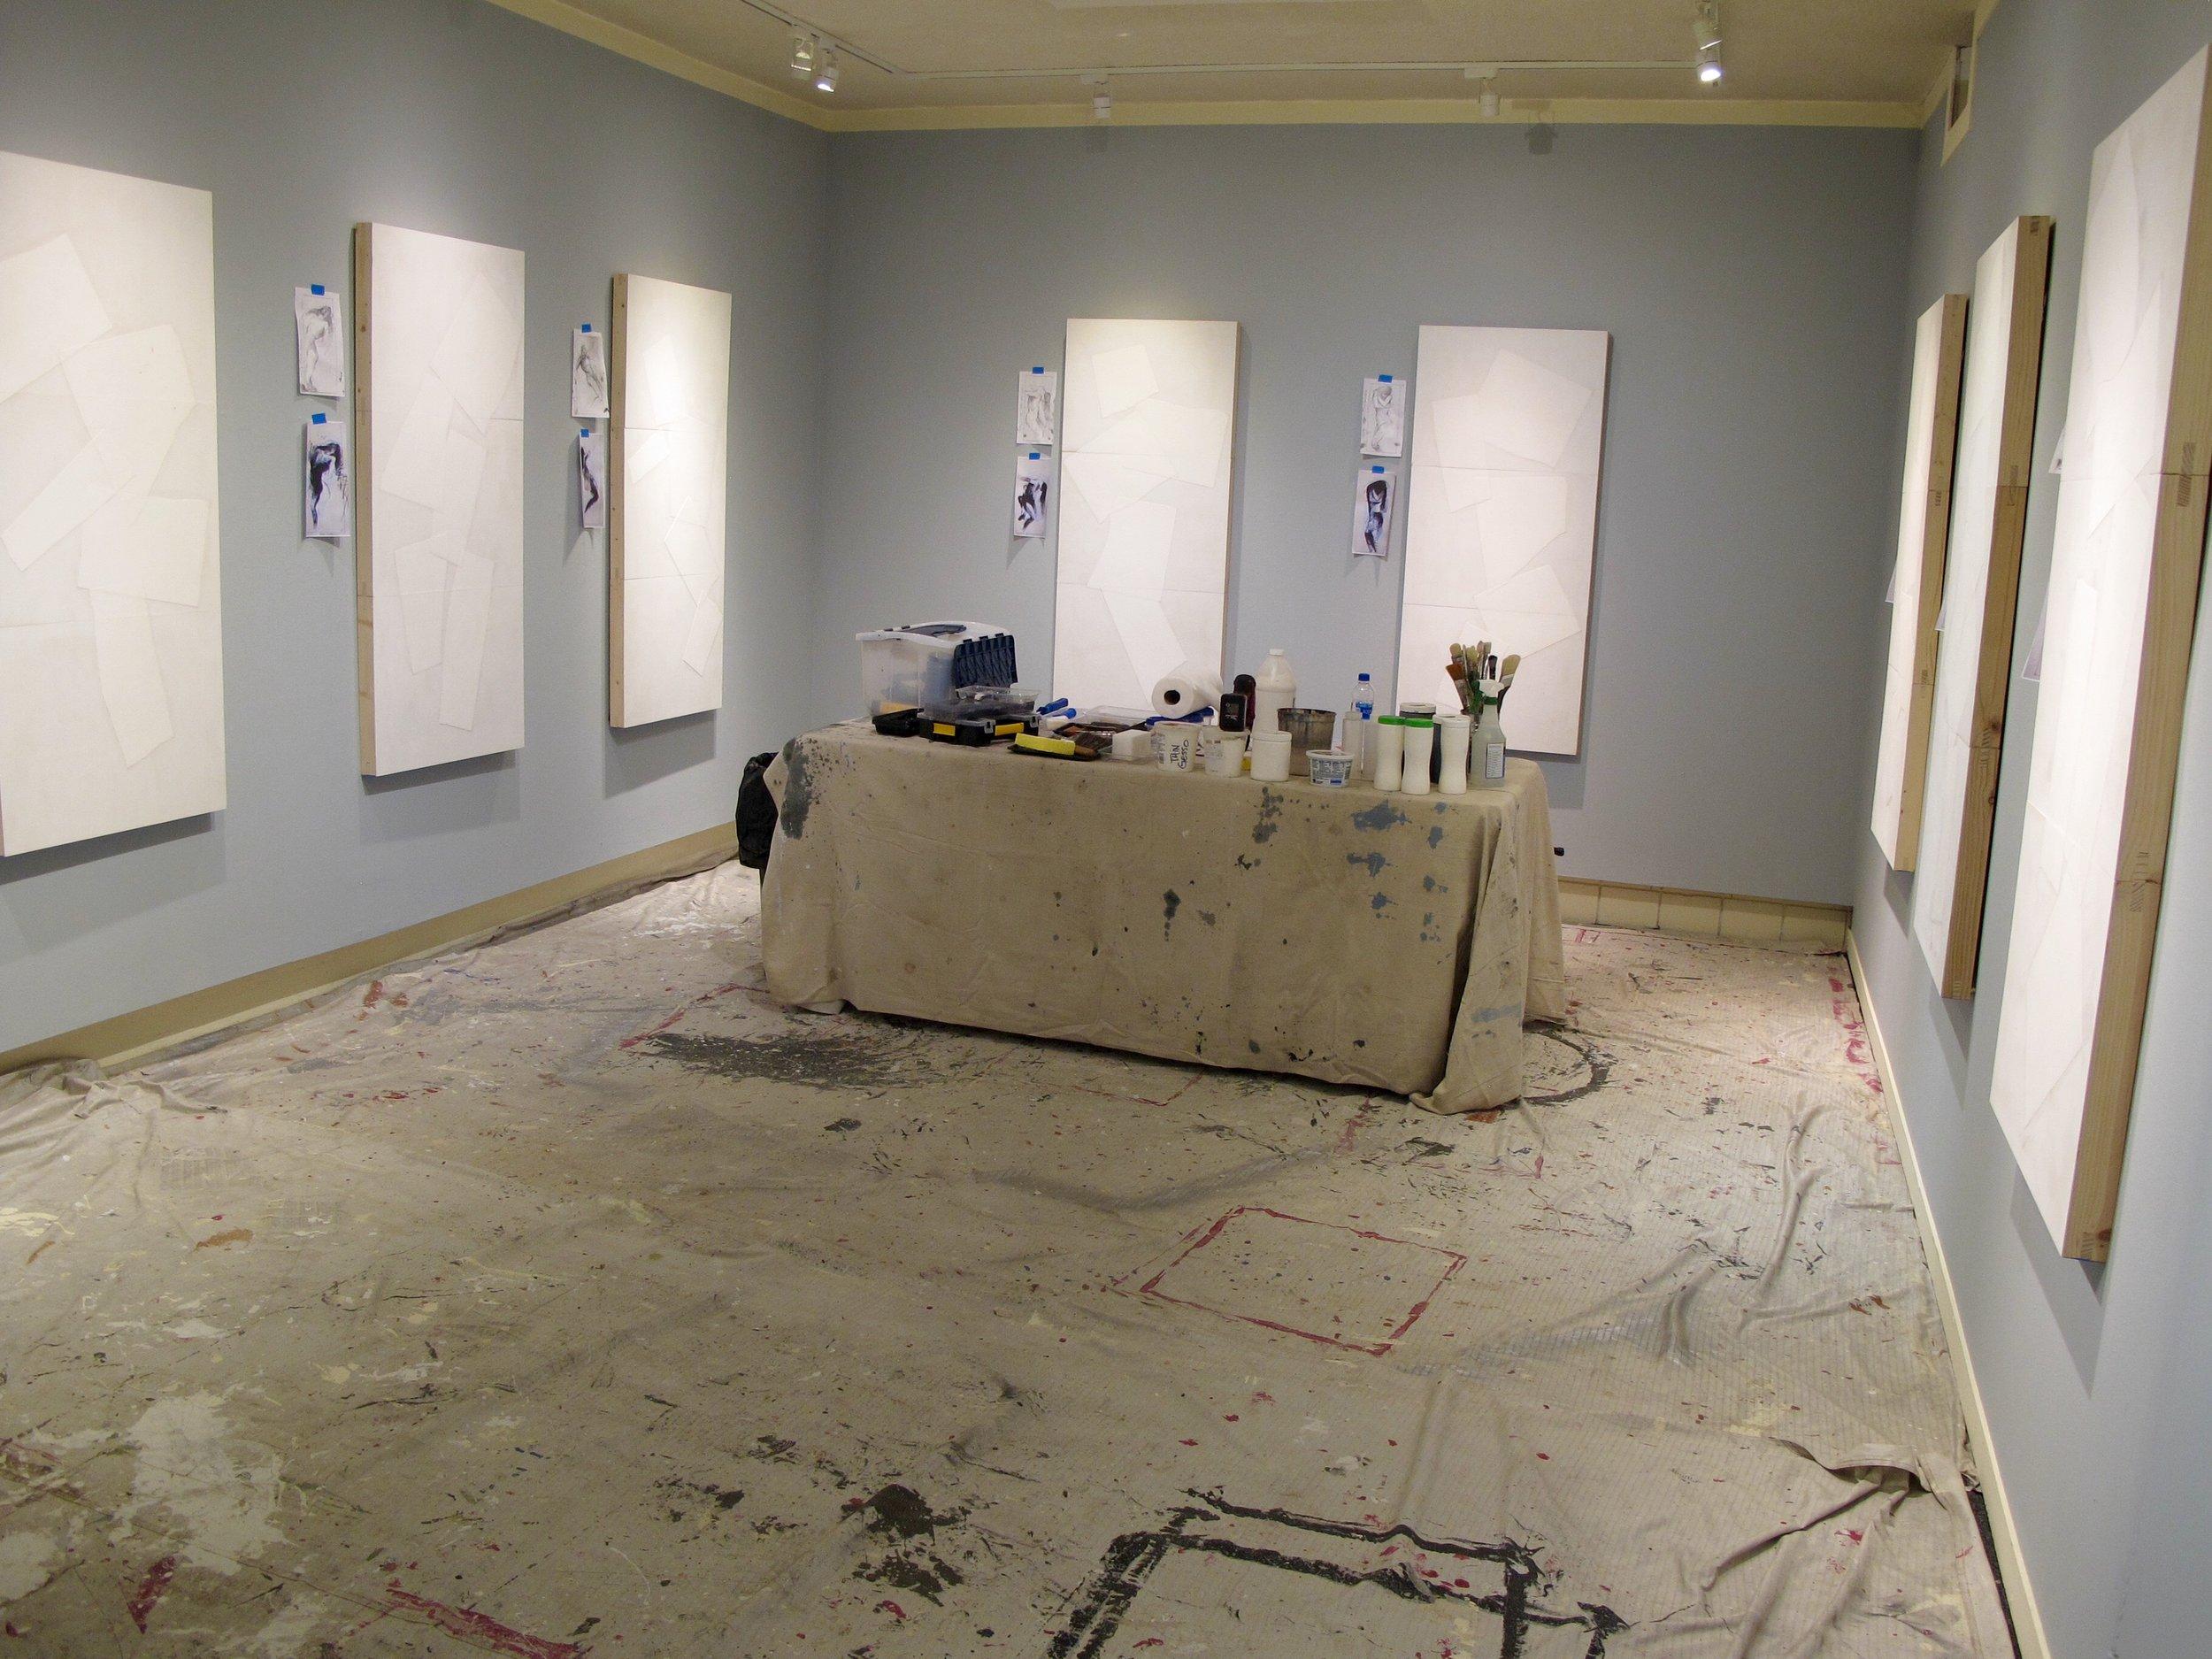 ©2018 David Limrite Artist Teacher Coach Mentor, Artist in Residence San Luis Obispo Museum of Art Figure Drawing & Painting Workshops